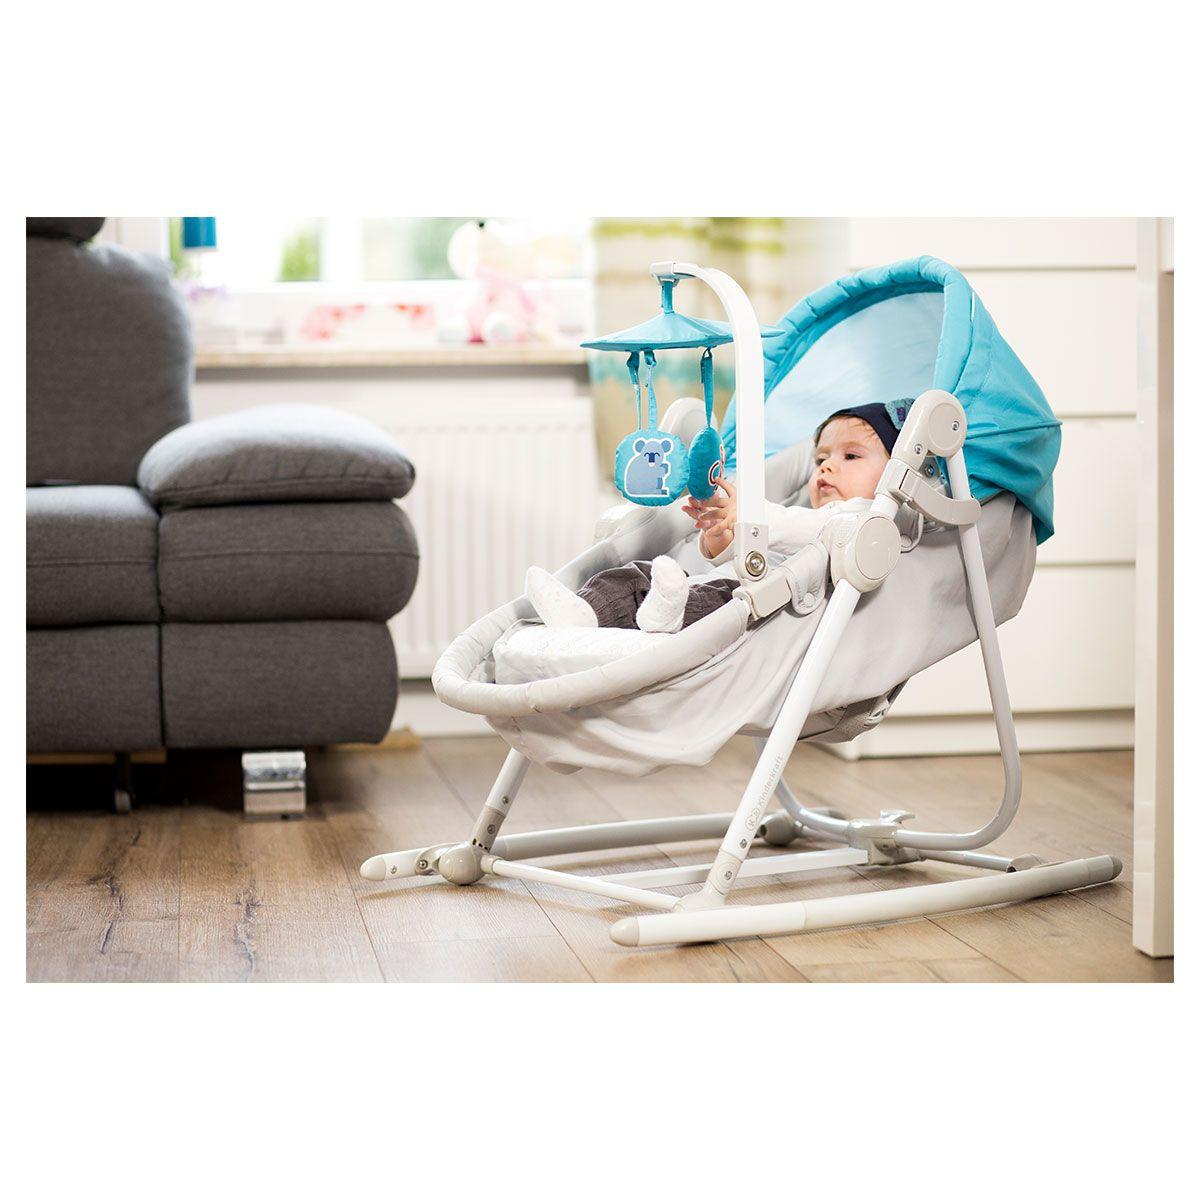 kinderkraft unimo babywippe babyschaukel baby wippe liege wiege babysitz top neu ebay. Black Bedroom Furniture Sets. Home Design Ideas